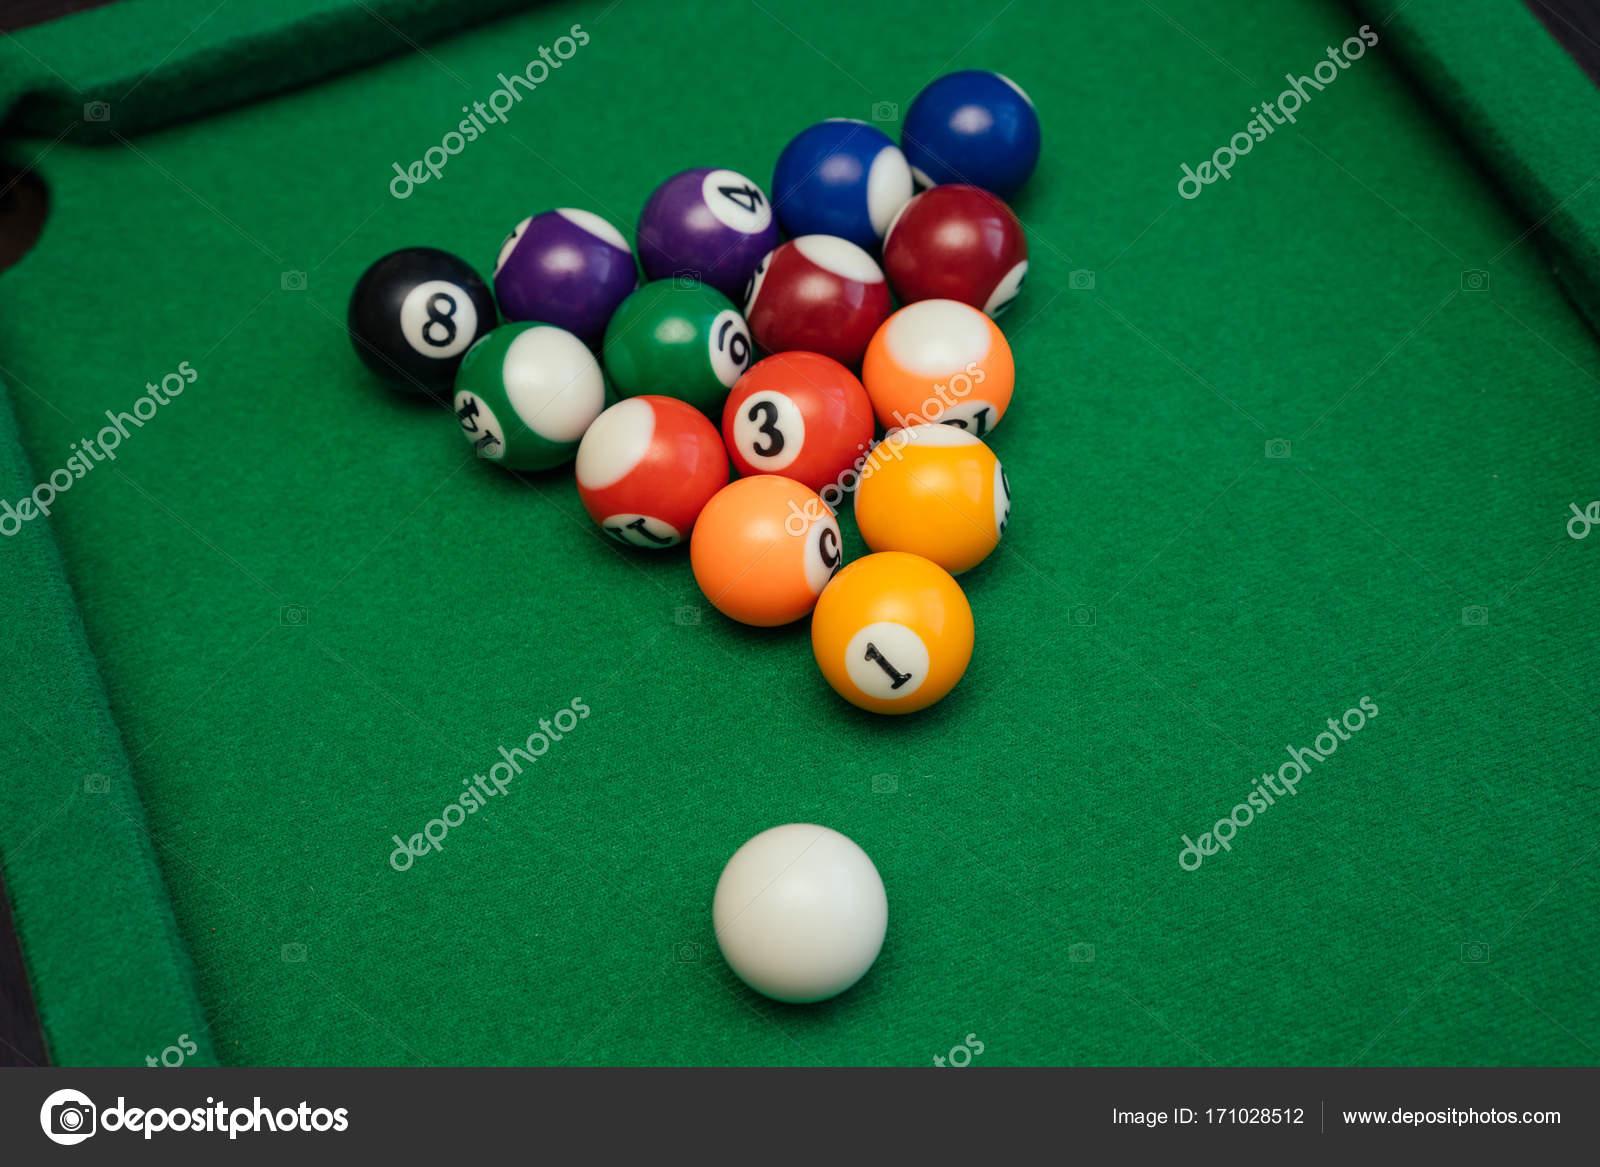 American Billiards Pool On A Green Table Stock Photo DEJAVU - Us billiards pool table